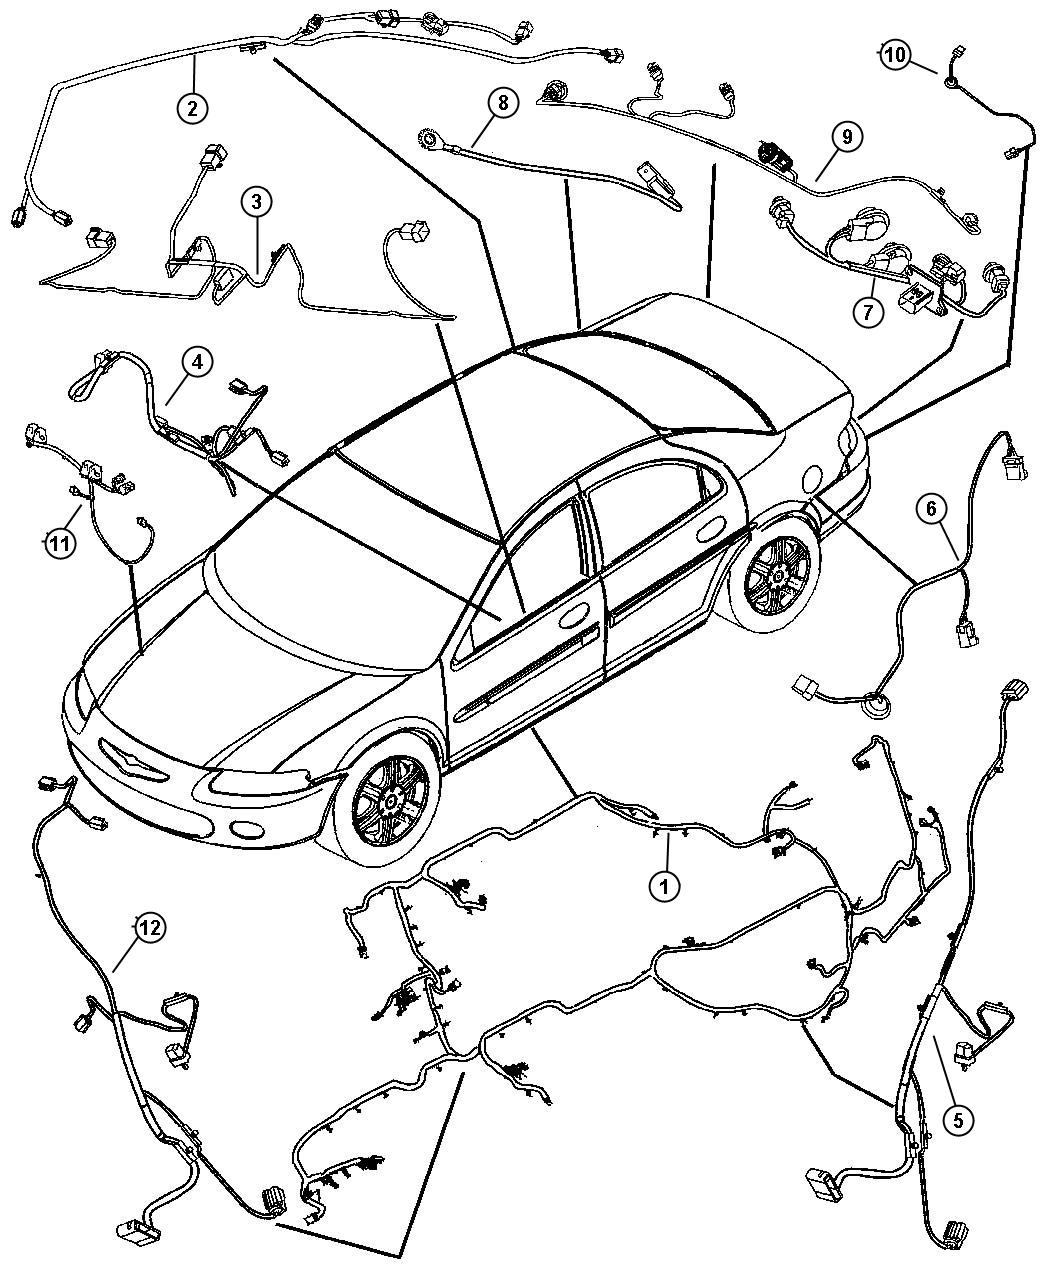 Chrysler Sebring Wiring Unified Body Radioside